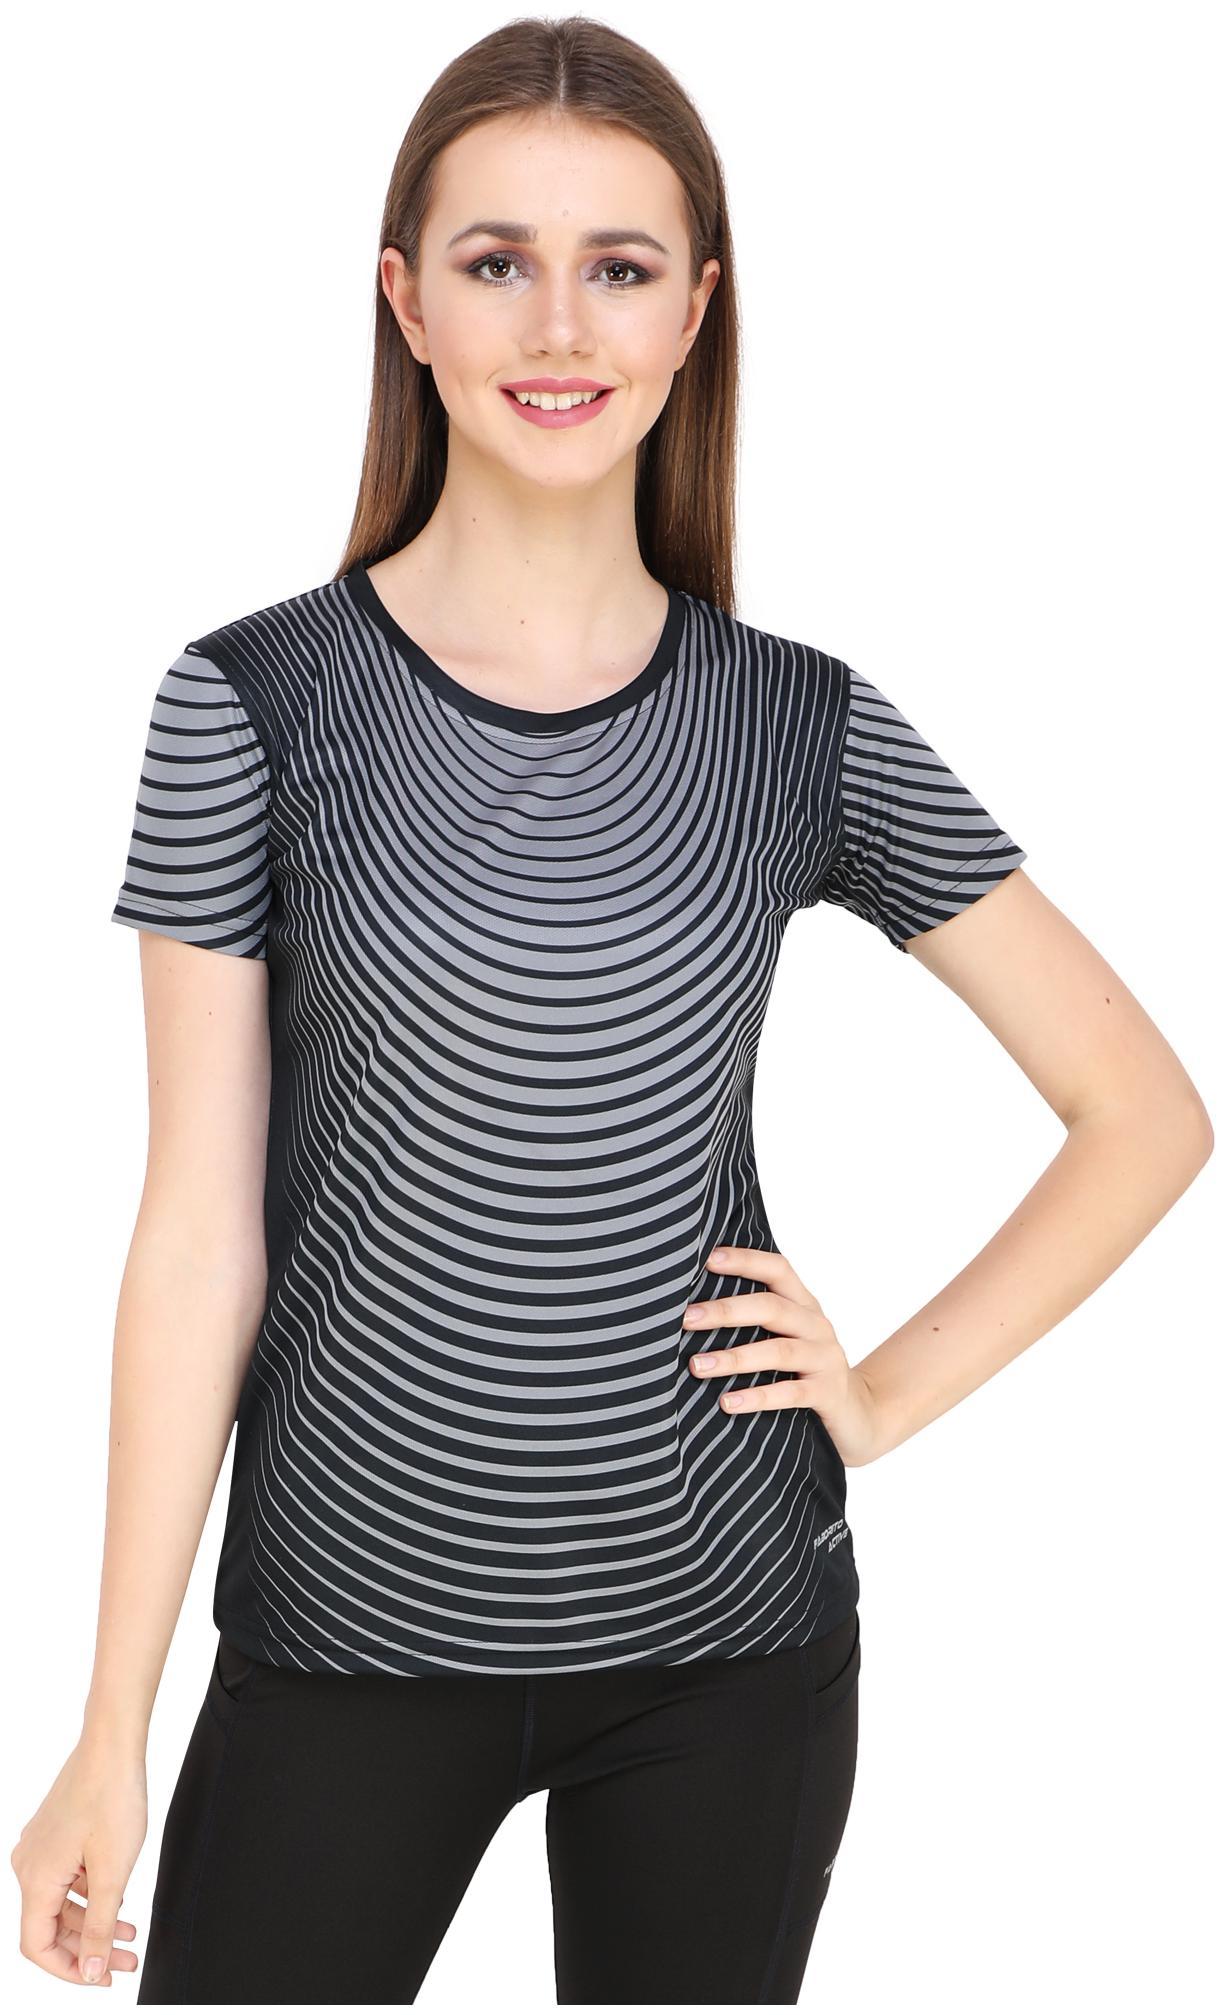 FABORITO Women Striped Sports T Shirt   Grey   Black